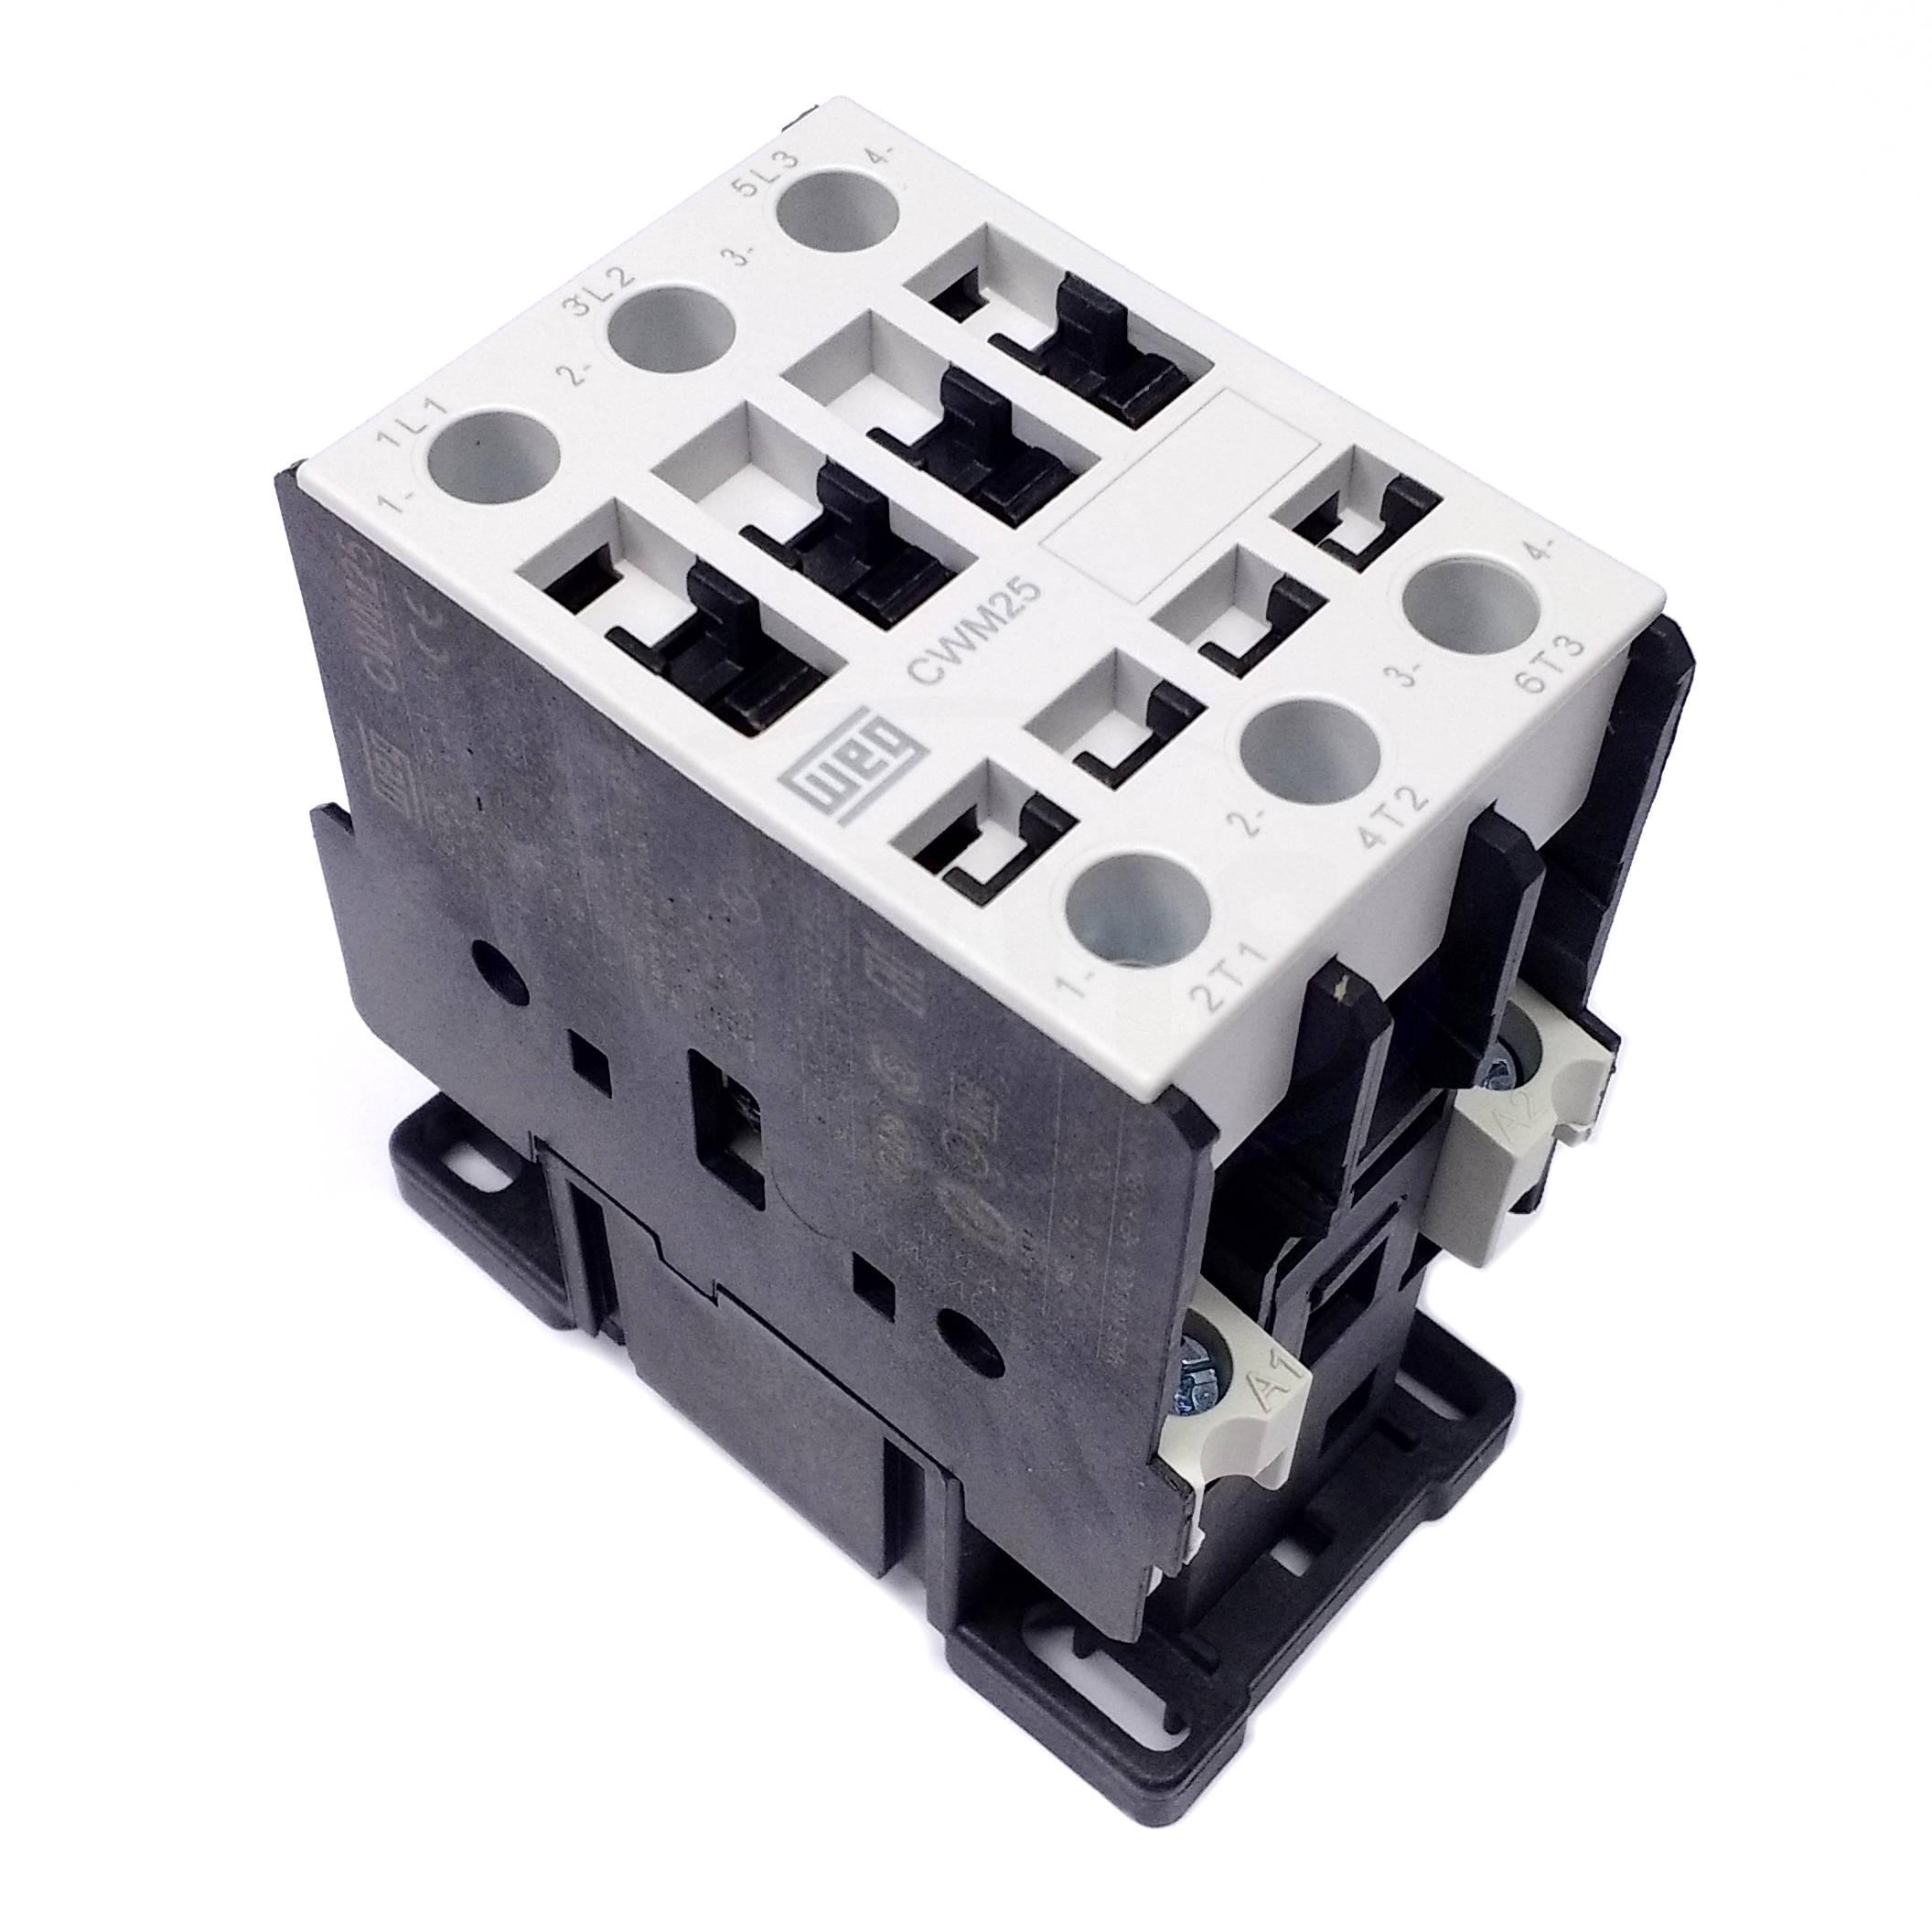 CWM25-00-30V24 WEG 3-Pole IEC Standard Contactor 1